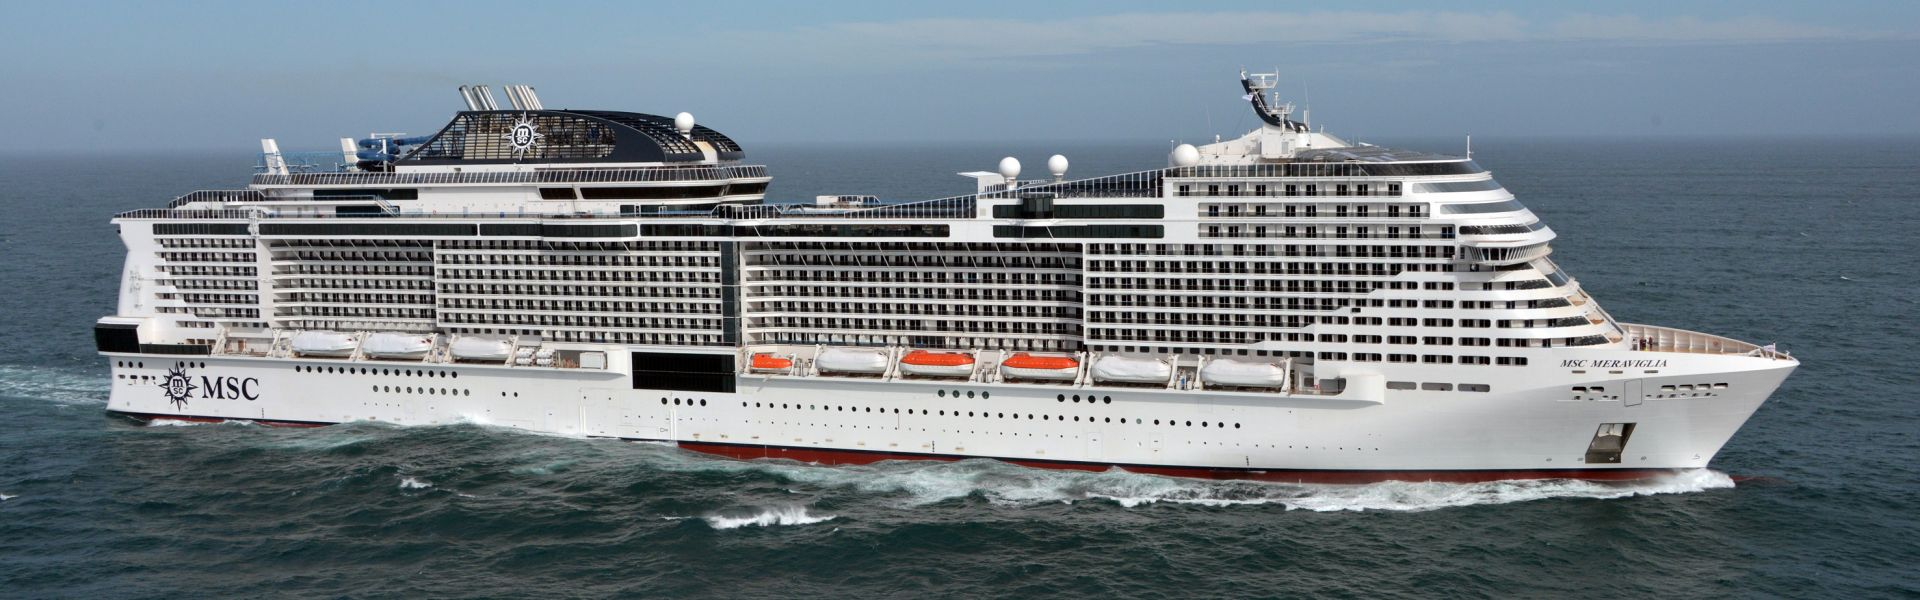 Croaziera 2018/2019 - Mediterana de Vest (Genova) - MSC Cruises - MSC Meraviglia - 7 nopti